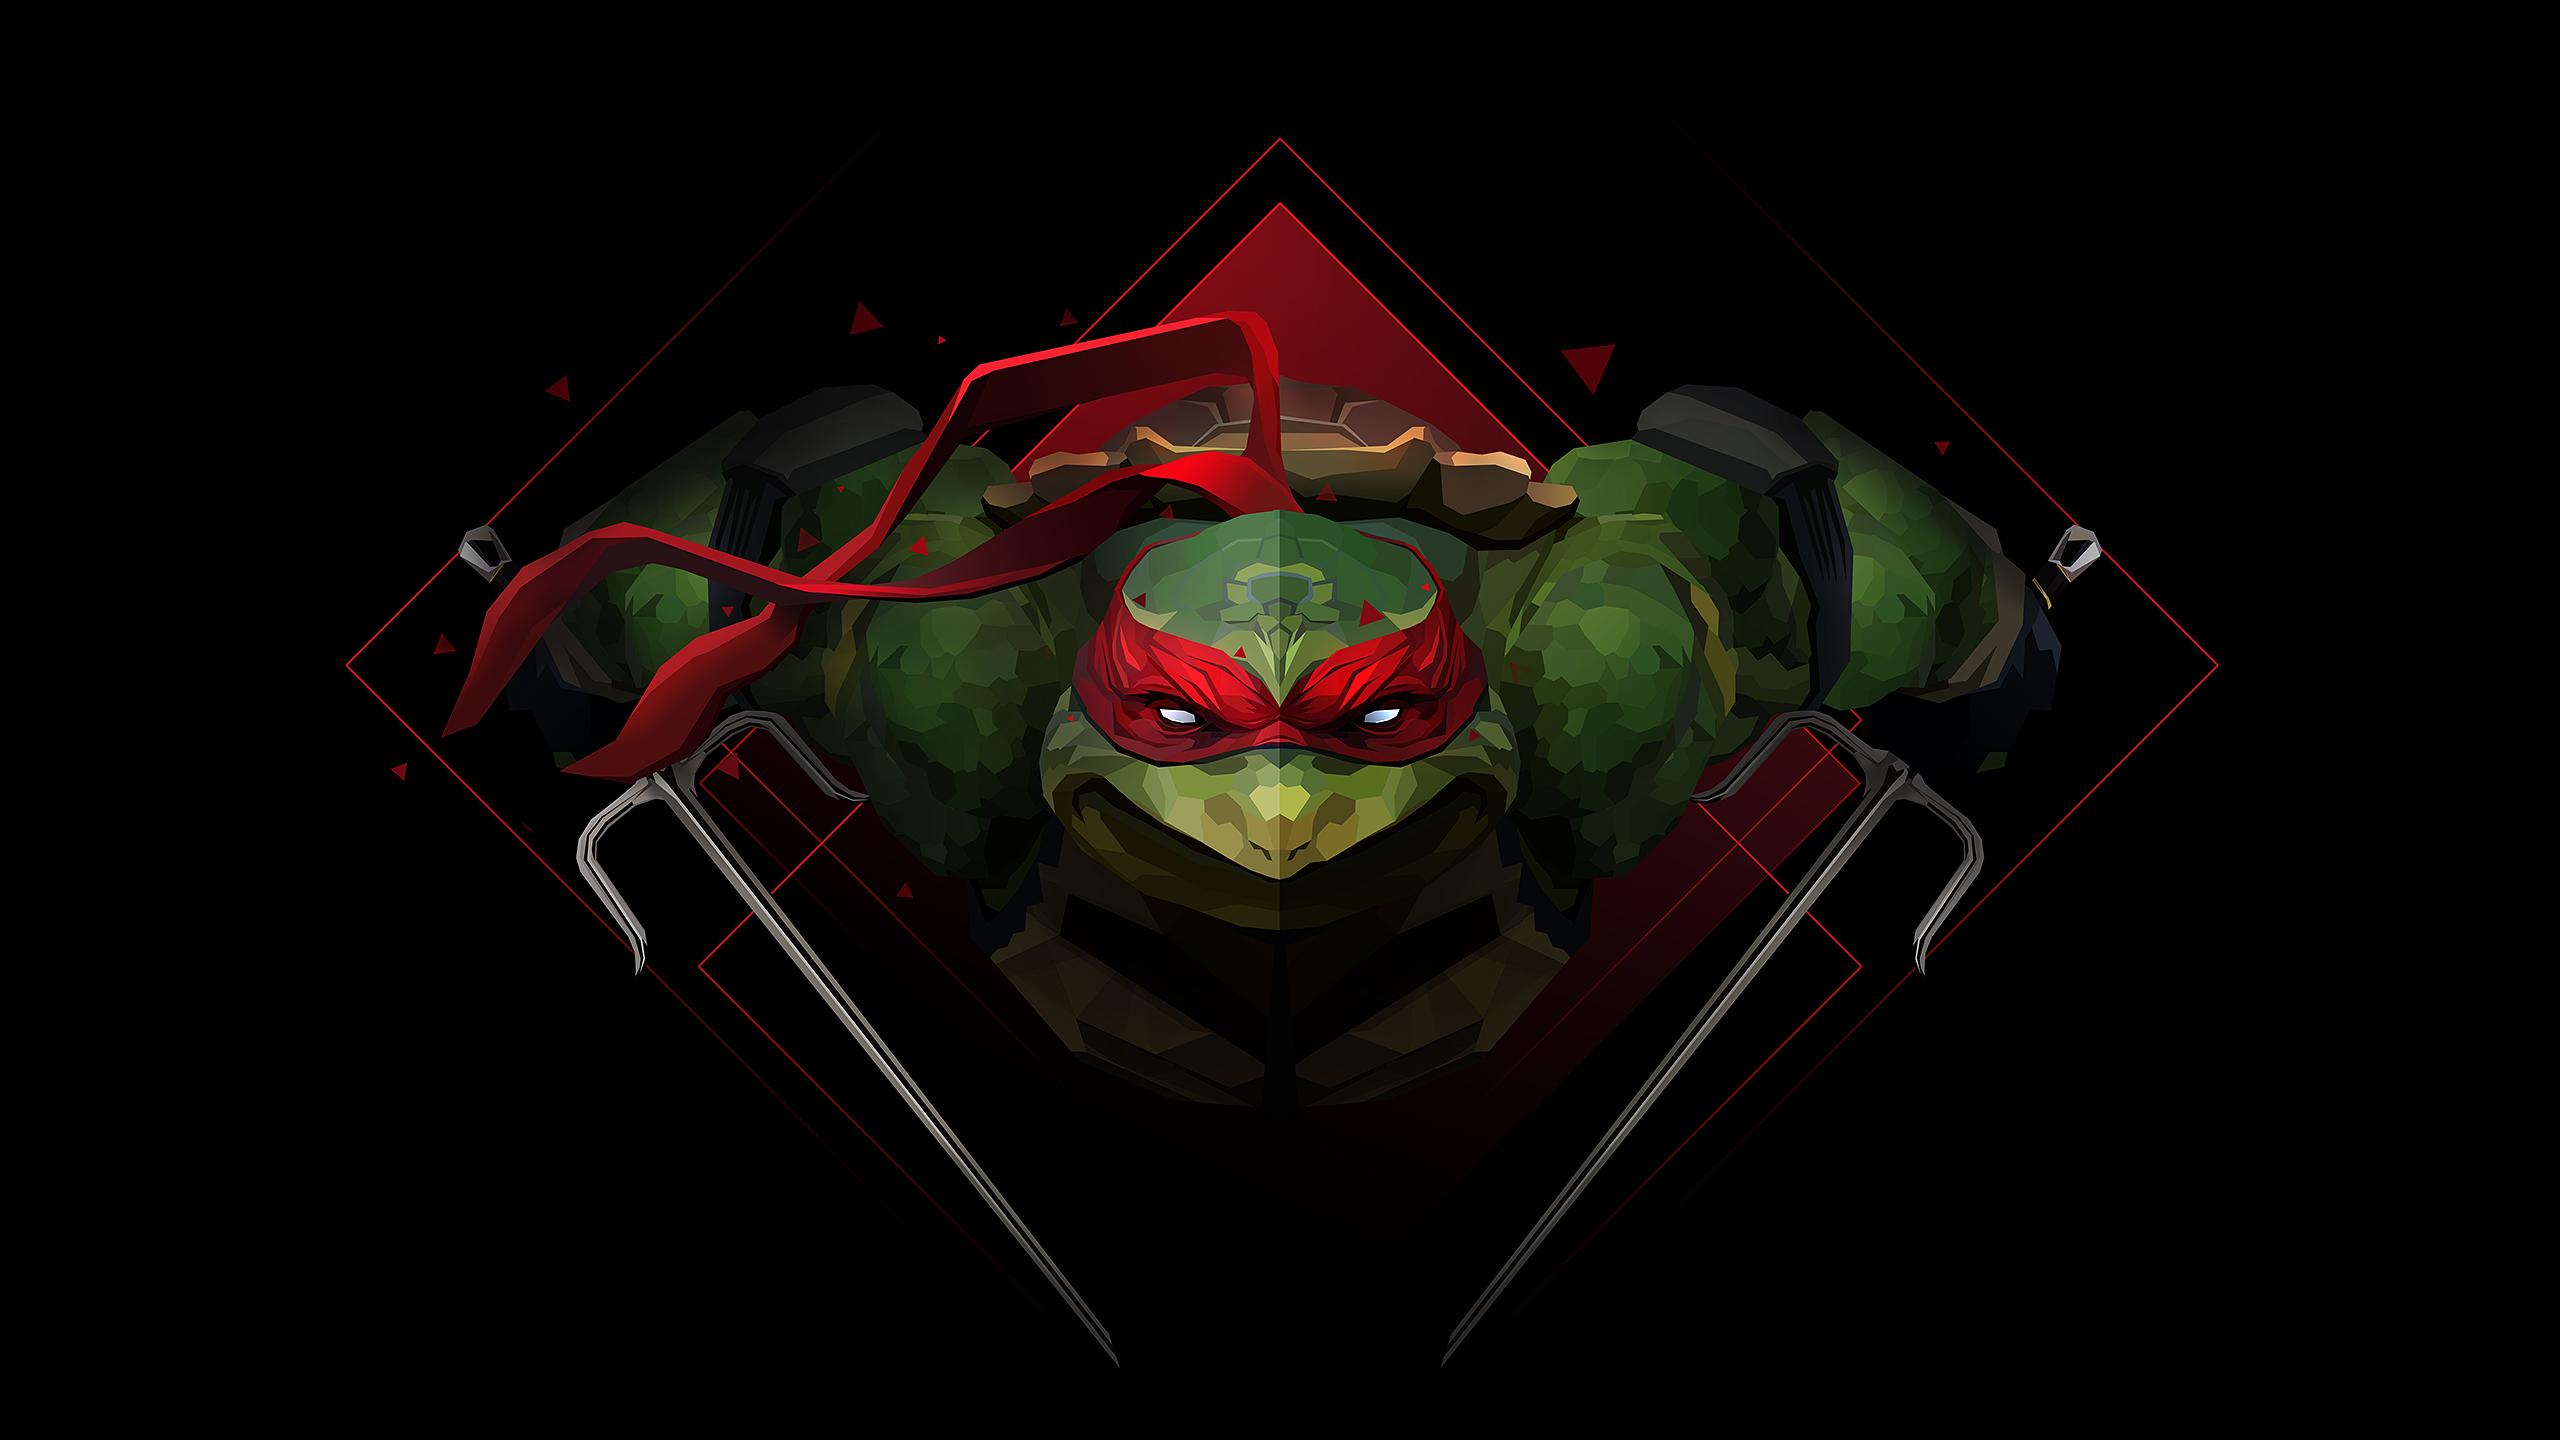 Teenage Mutant Ninja Turtles Desktop Wallpaper 2560x1440